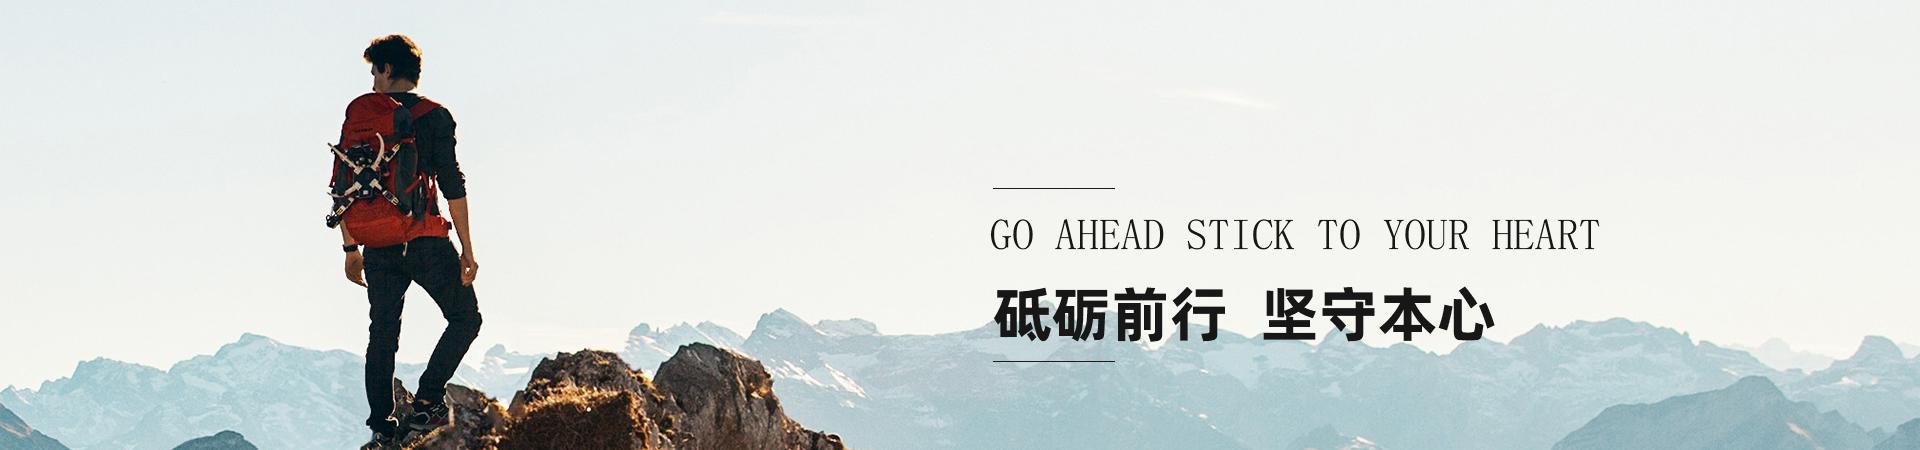 http://www.xingxiangfood.net/data/upload/202004/20200416100634_774.jpg